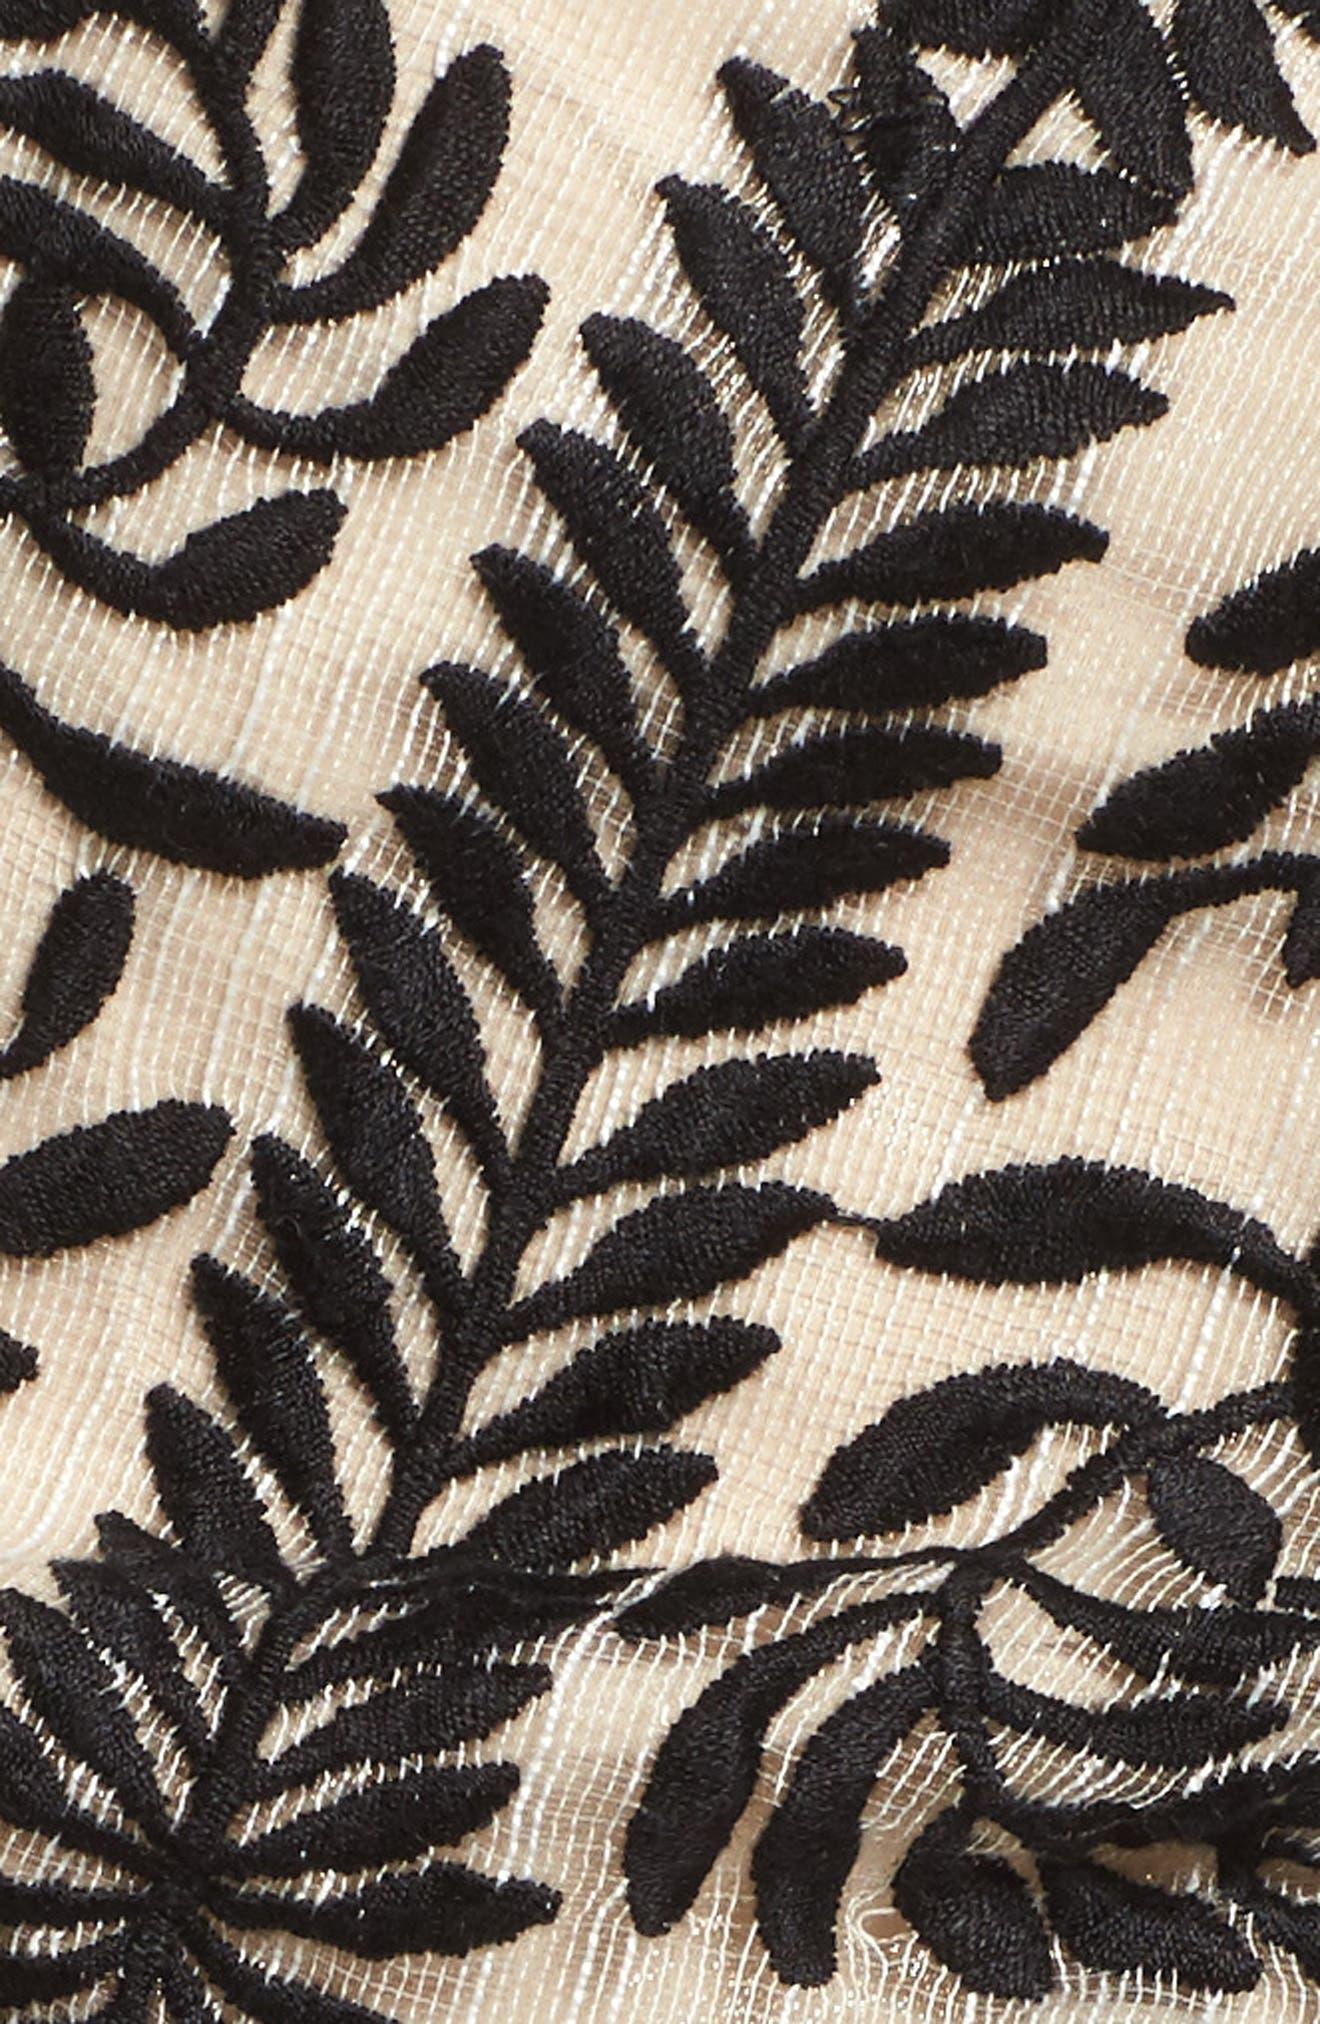 Soiree Ruffle Miniskirt,                             Alternate thumbnail 6, color,                             Black